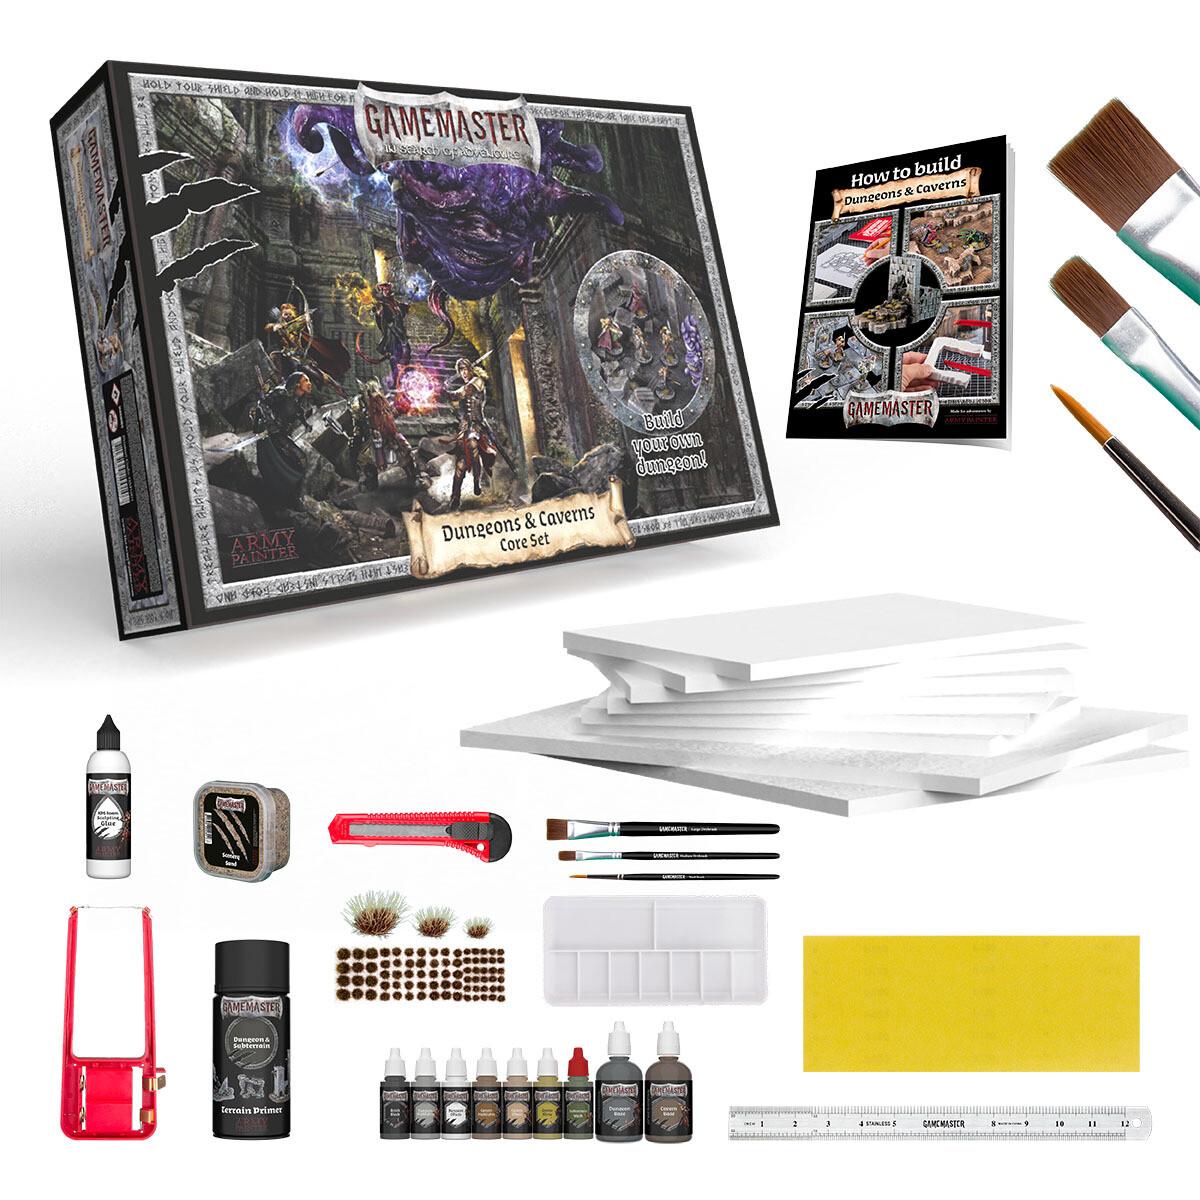 Gamemaster: Dungeons & Caverns Core Set - Army Painter